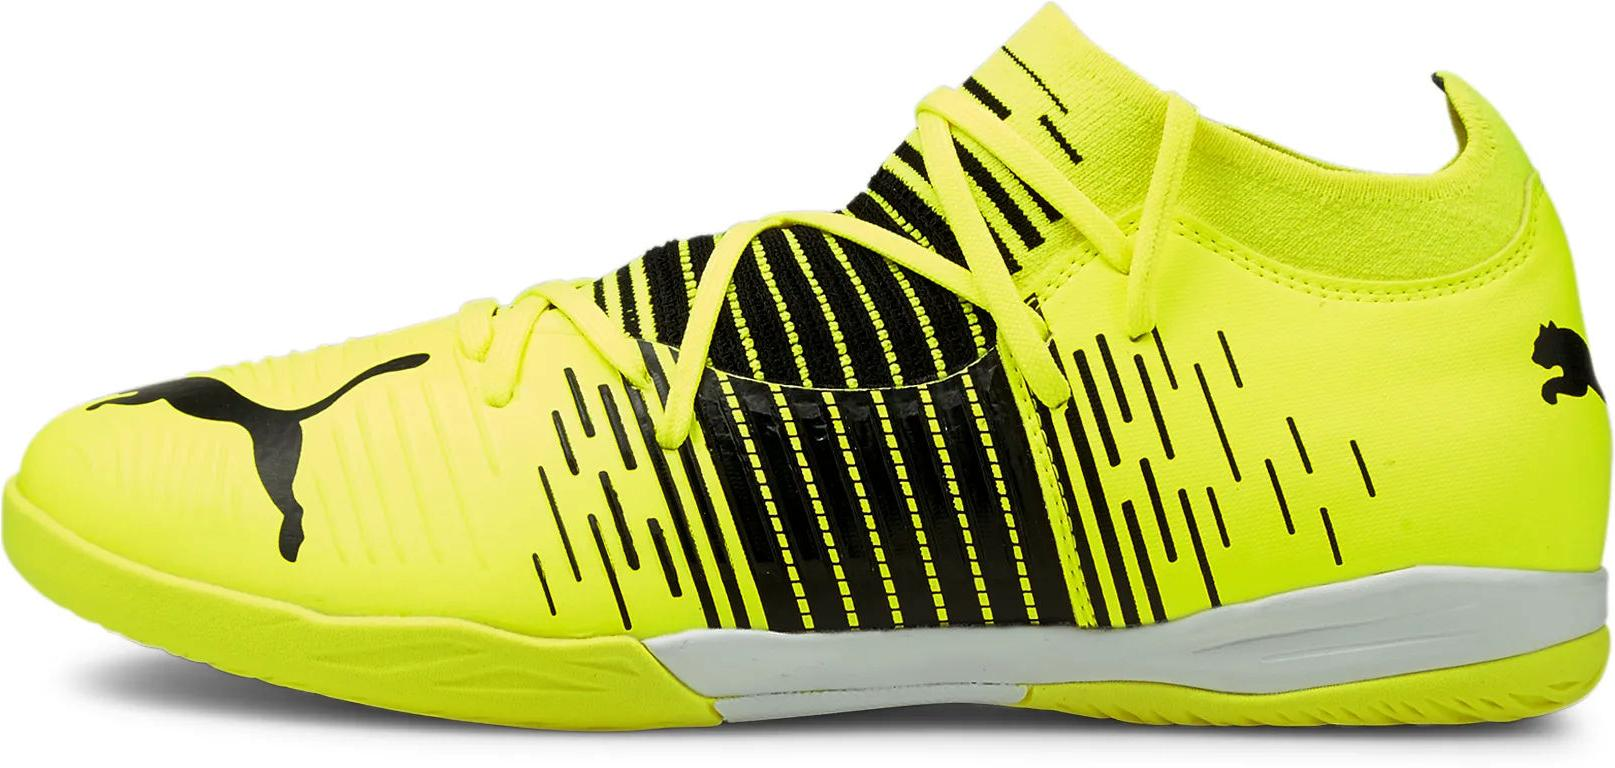 Sálovky Puma FUTURE Z 3.1 IT žlutá